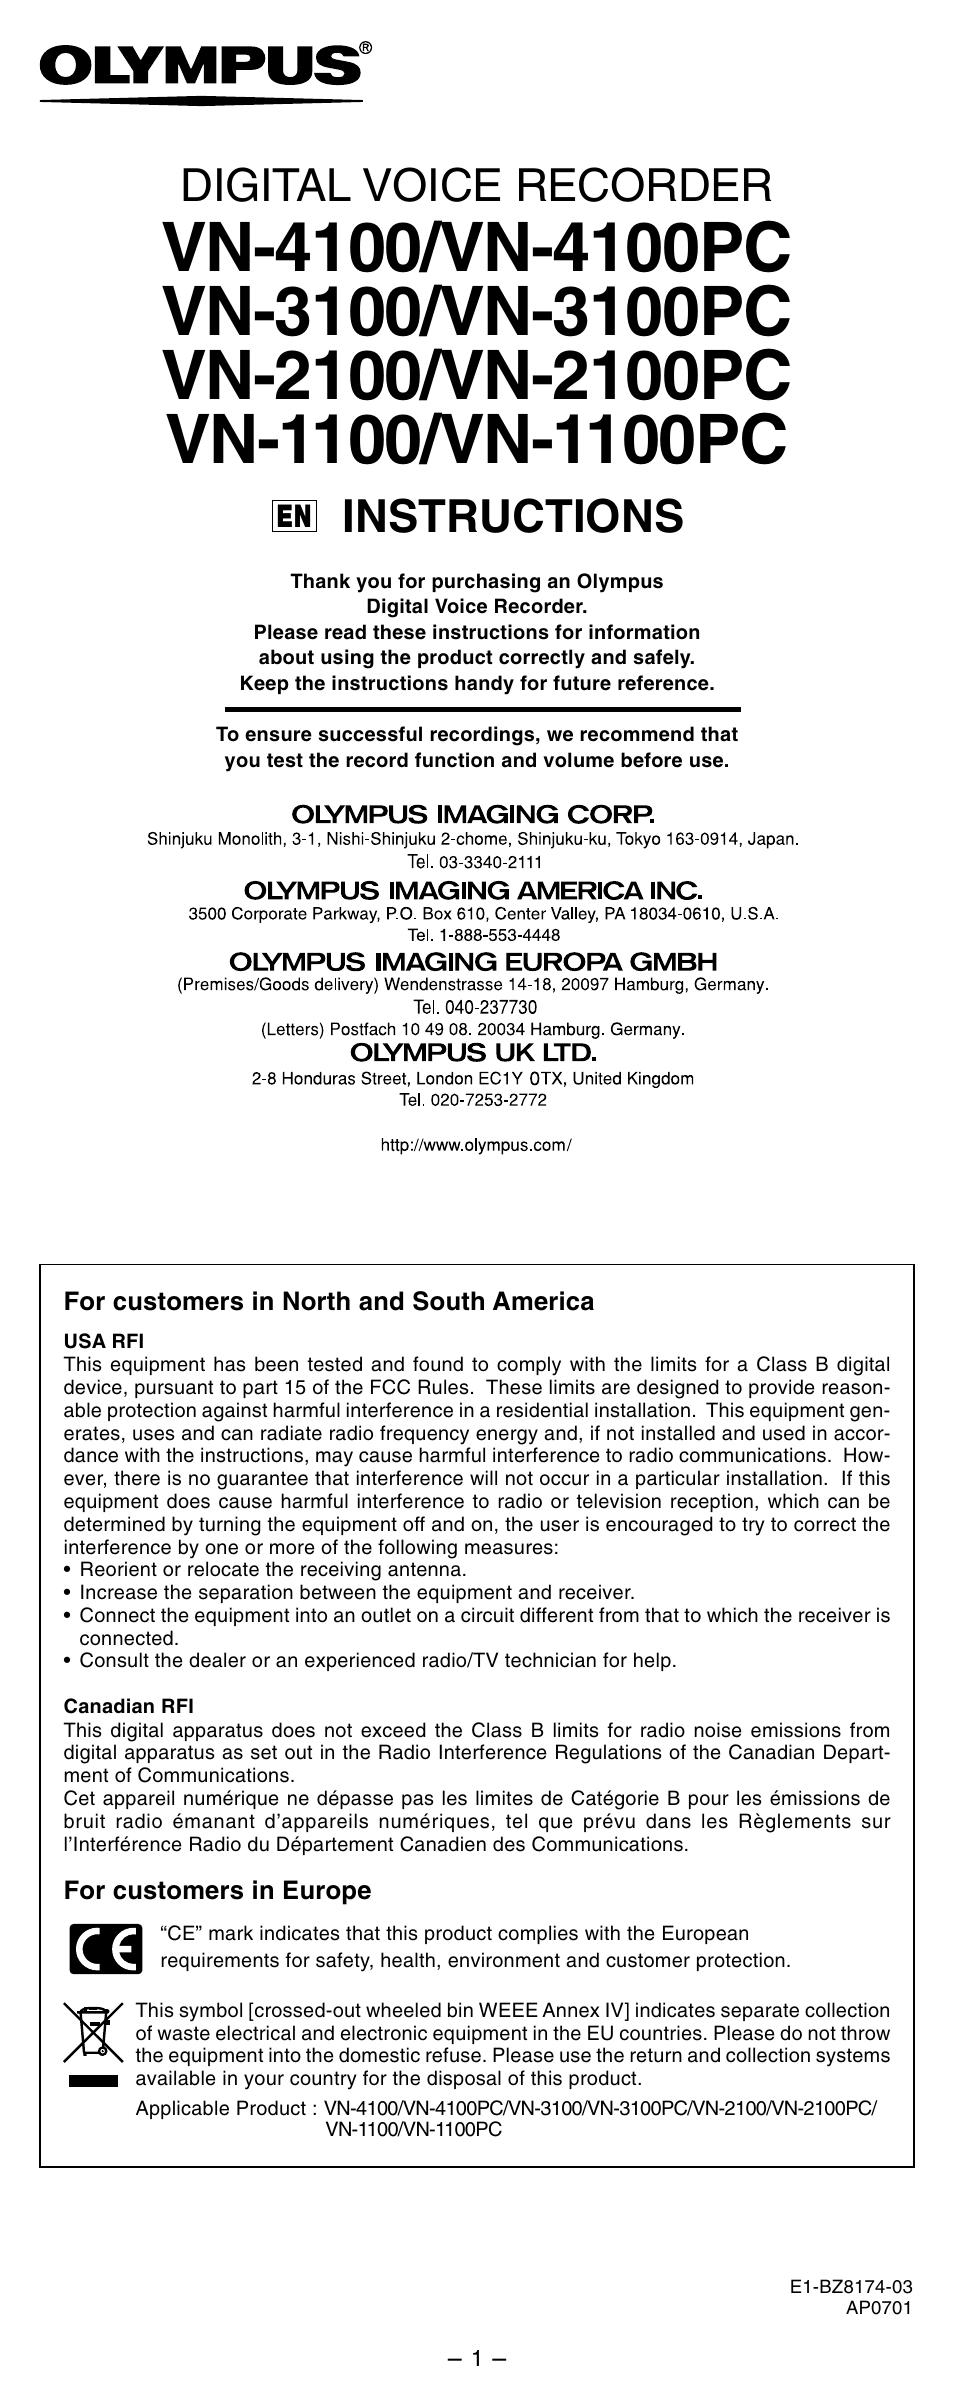 olympus vn 3100 user manual 10 pages also for vn 3100pc rh manualsdir com olympus vn-3100pc manual en español olympus digital voice recorder vn-3100pc manual español